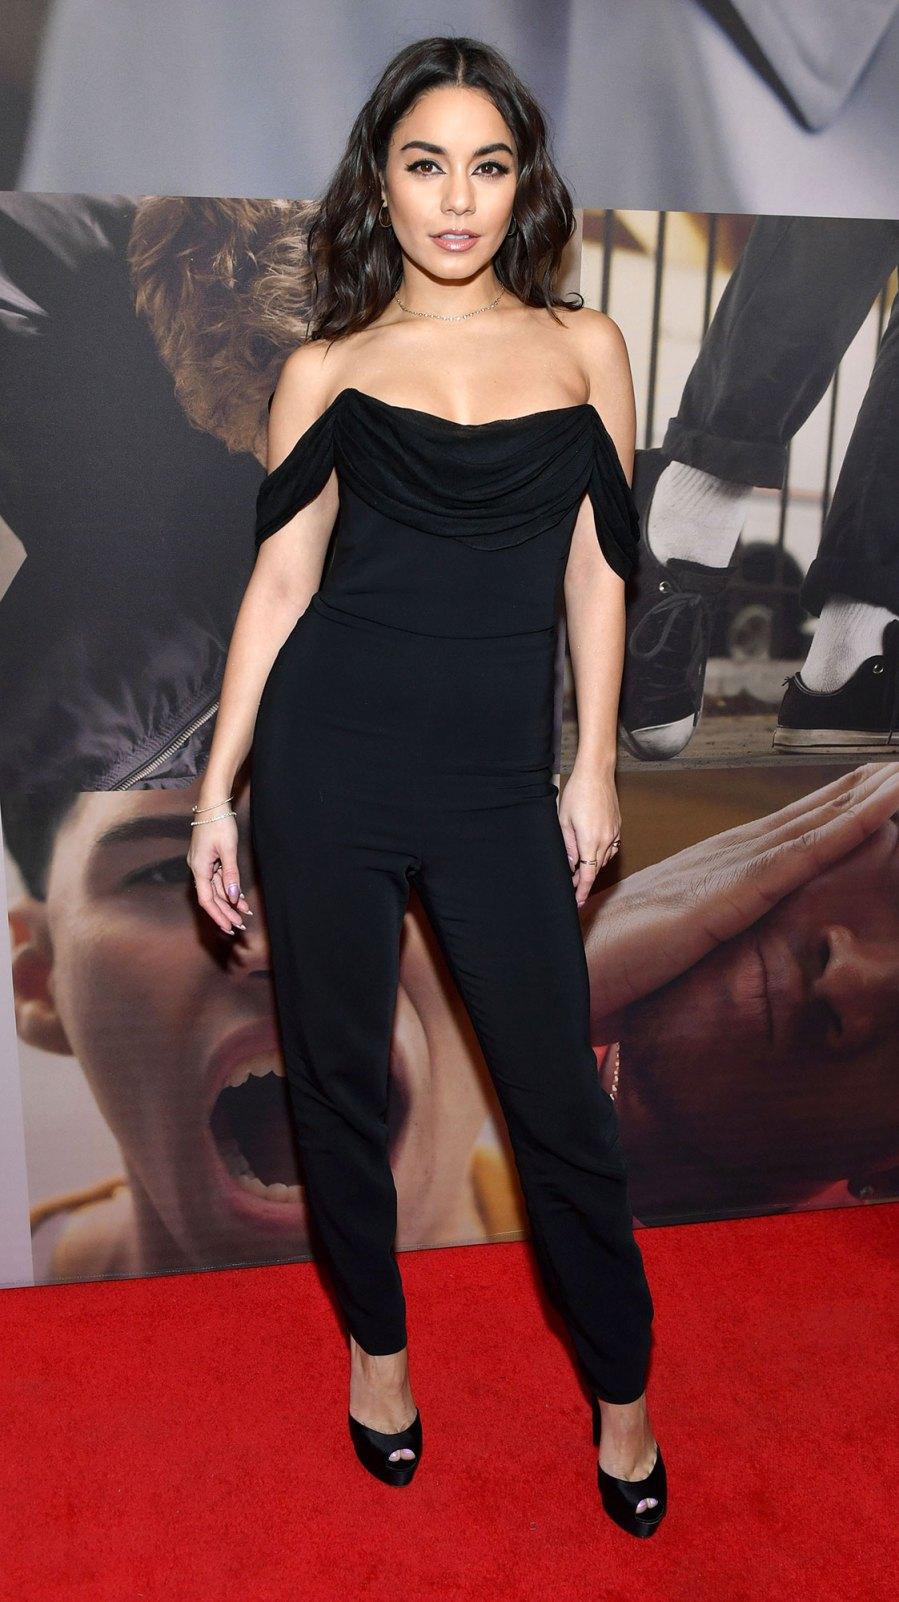 Vanessa Hudgens Stars Who Drew Backlash for Their Controversial Views on Coronavirus